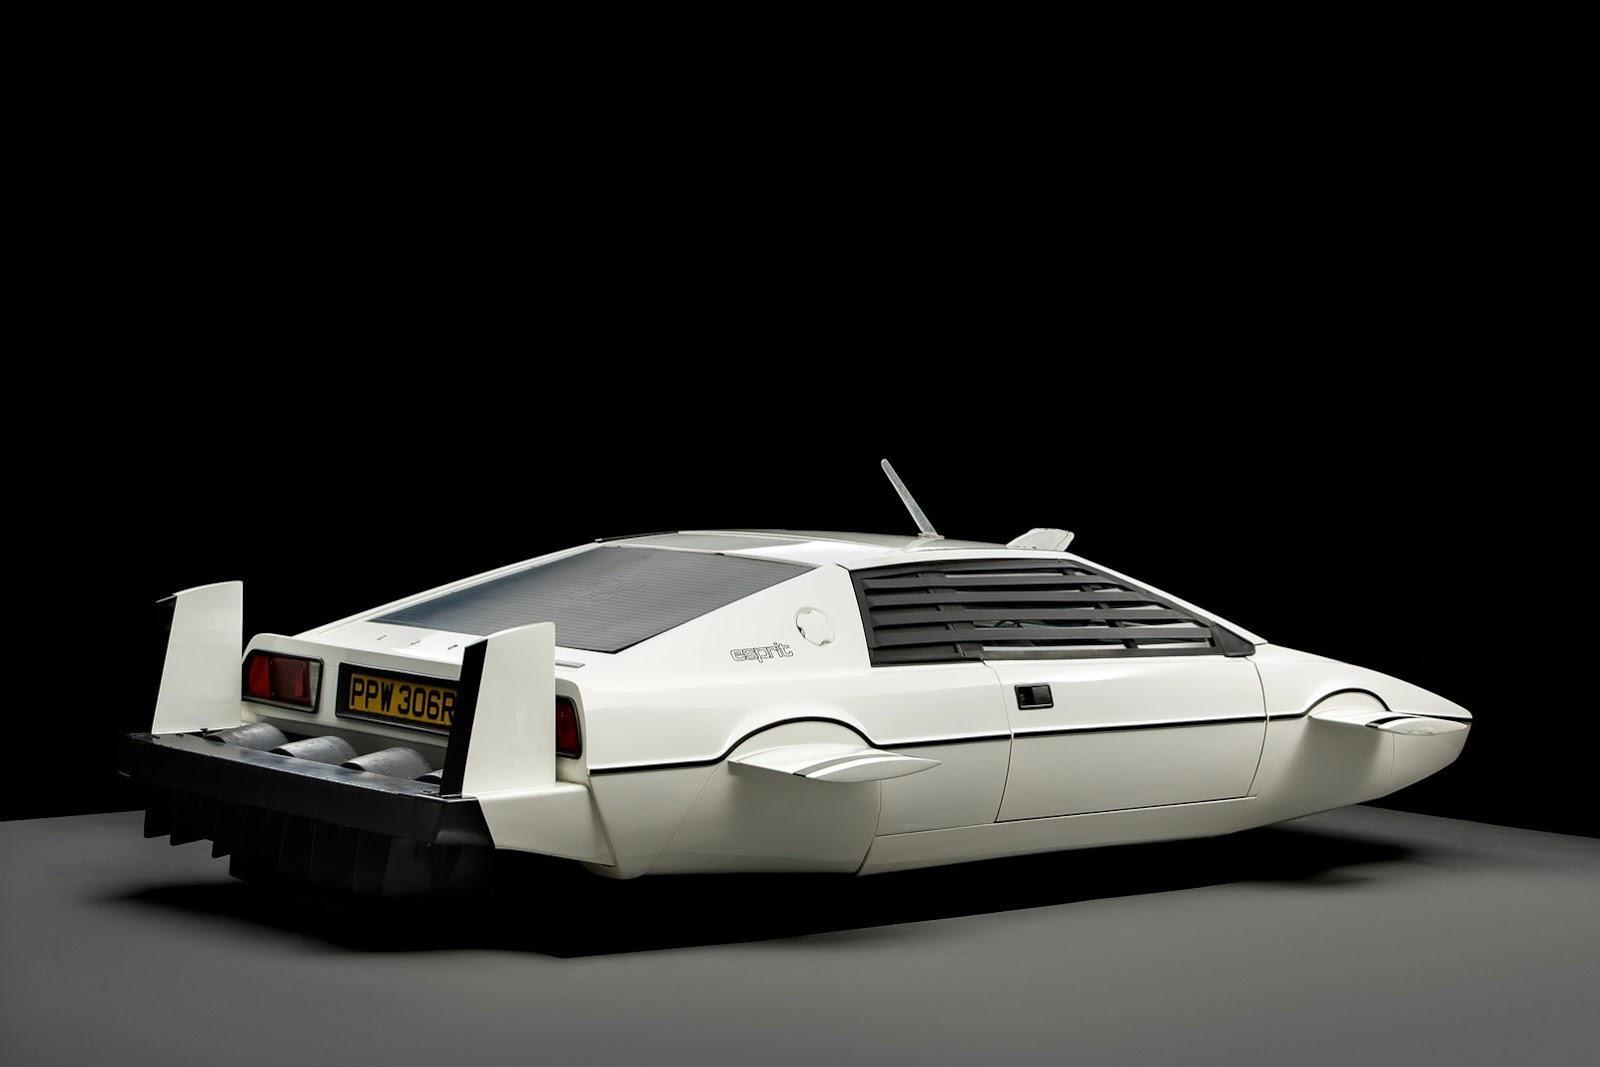 1977-lotus-esprit-submarine-james-bond-8